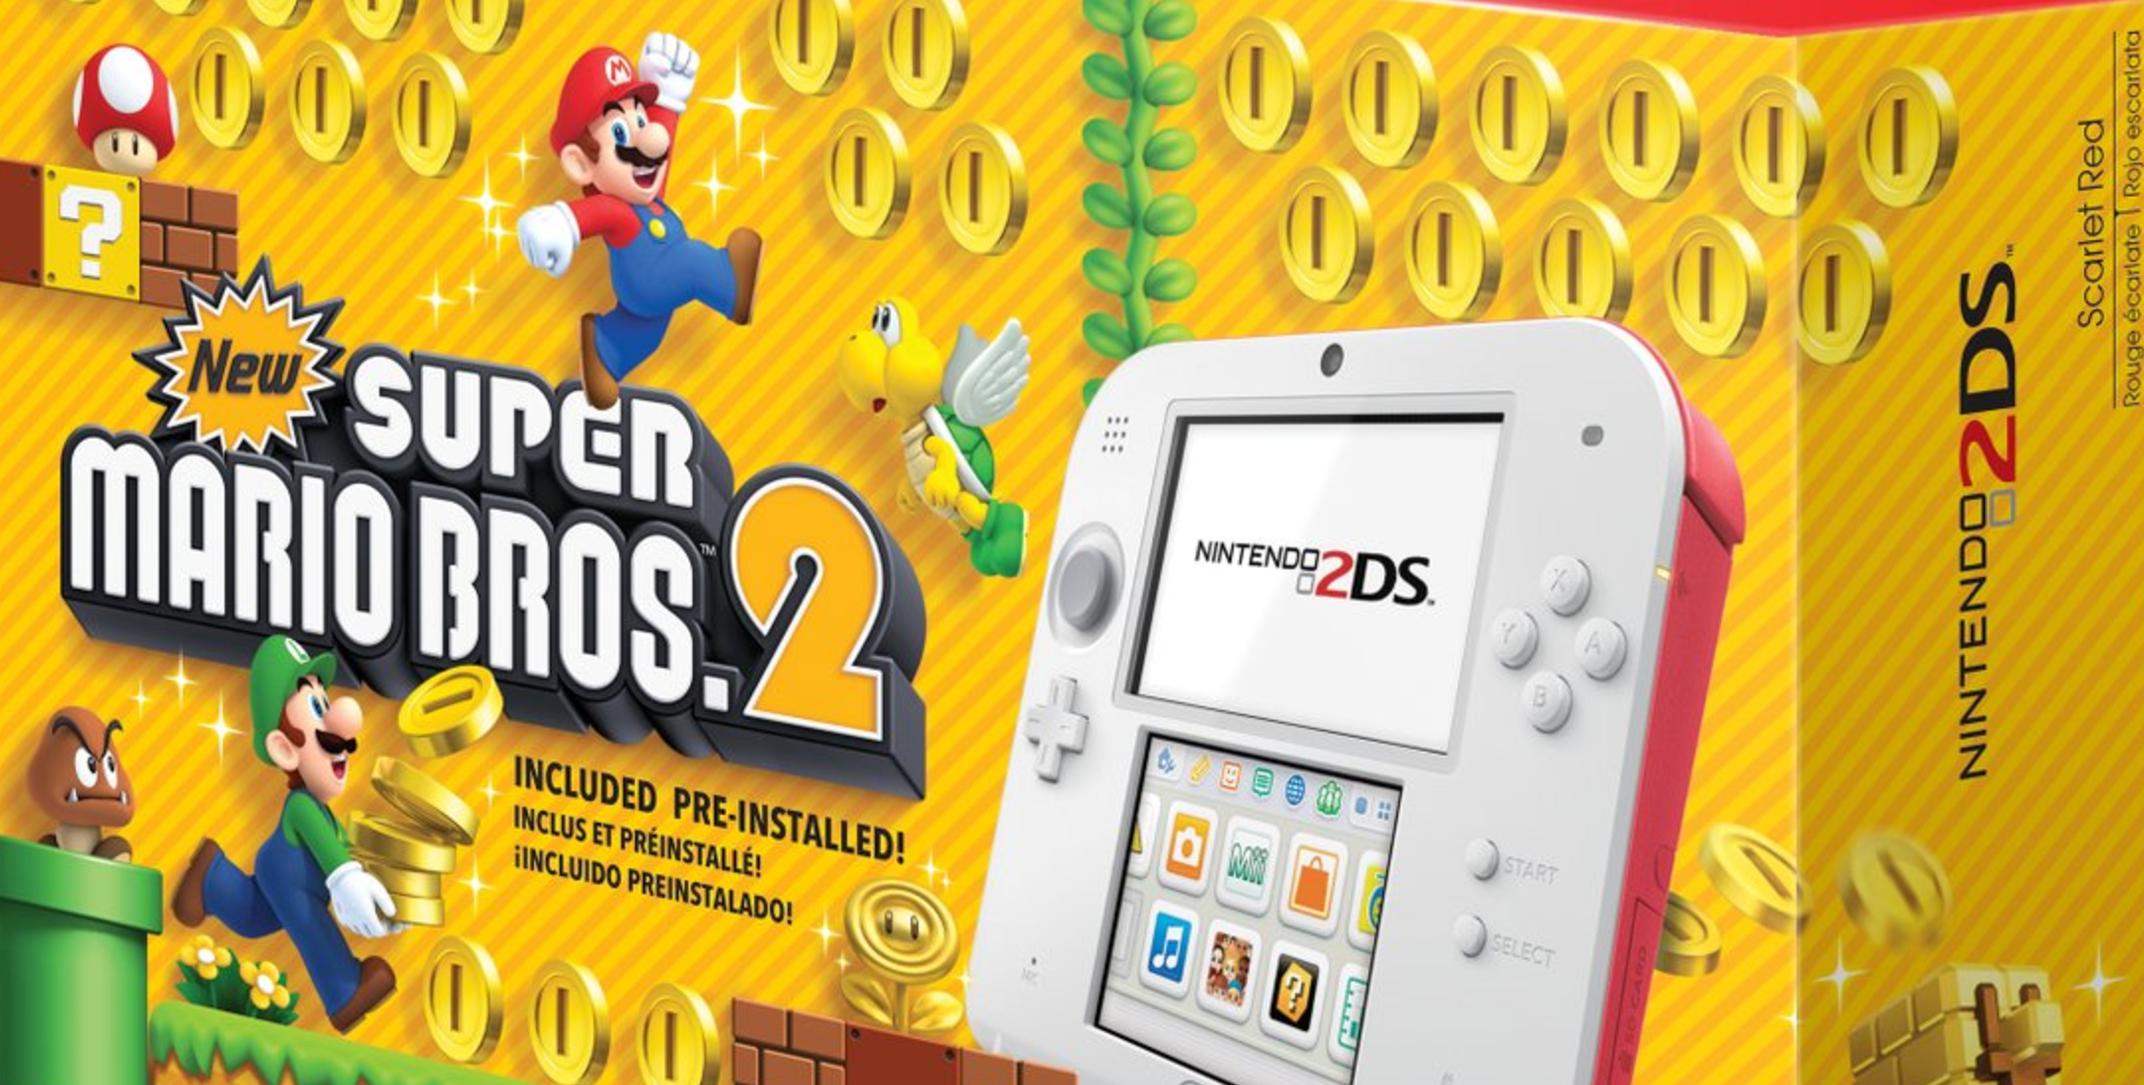 Nintendo Announces 2ds Super Mario Bros 2 Console Bundle Hits Next Switch Red Blue 2games 2amiibo Now